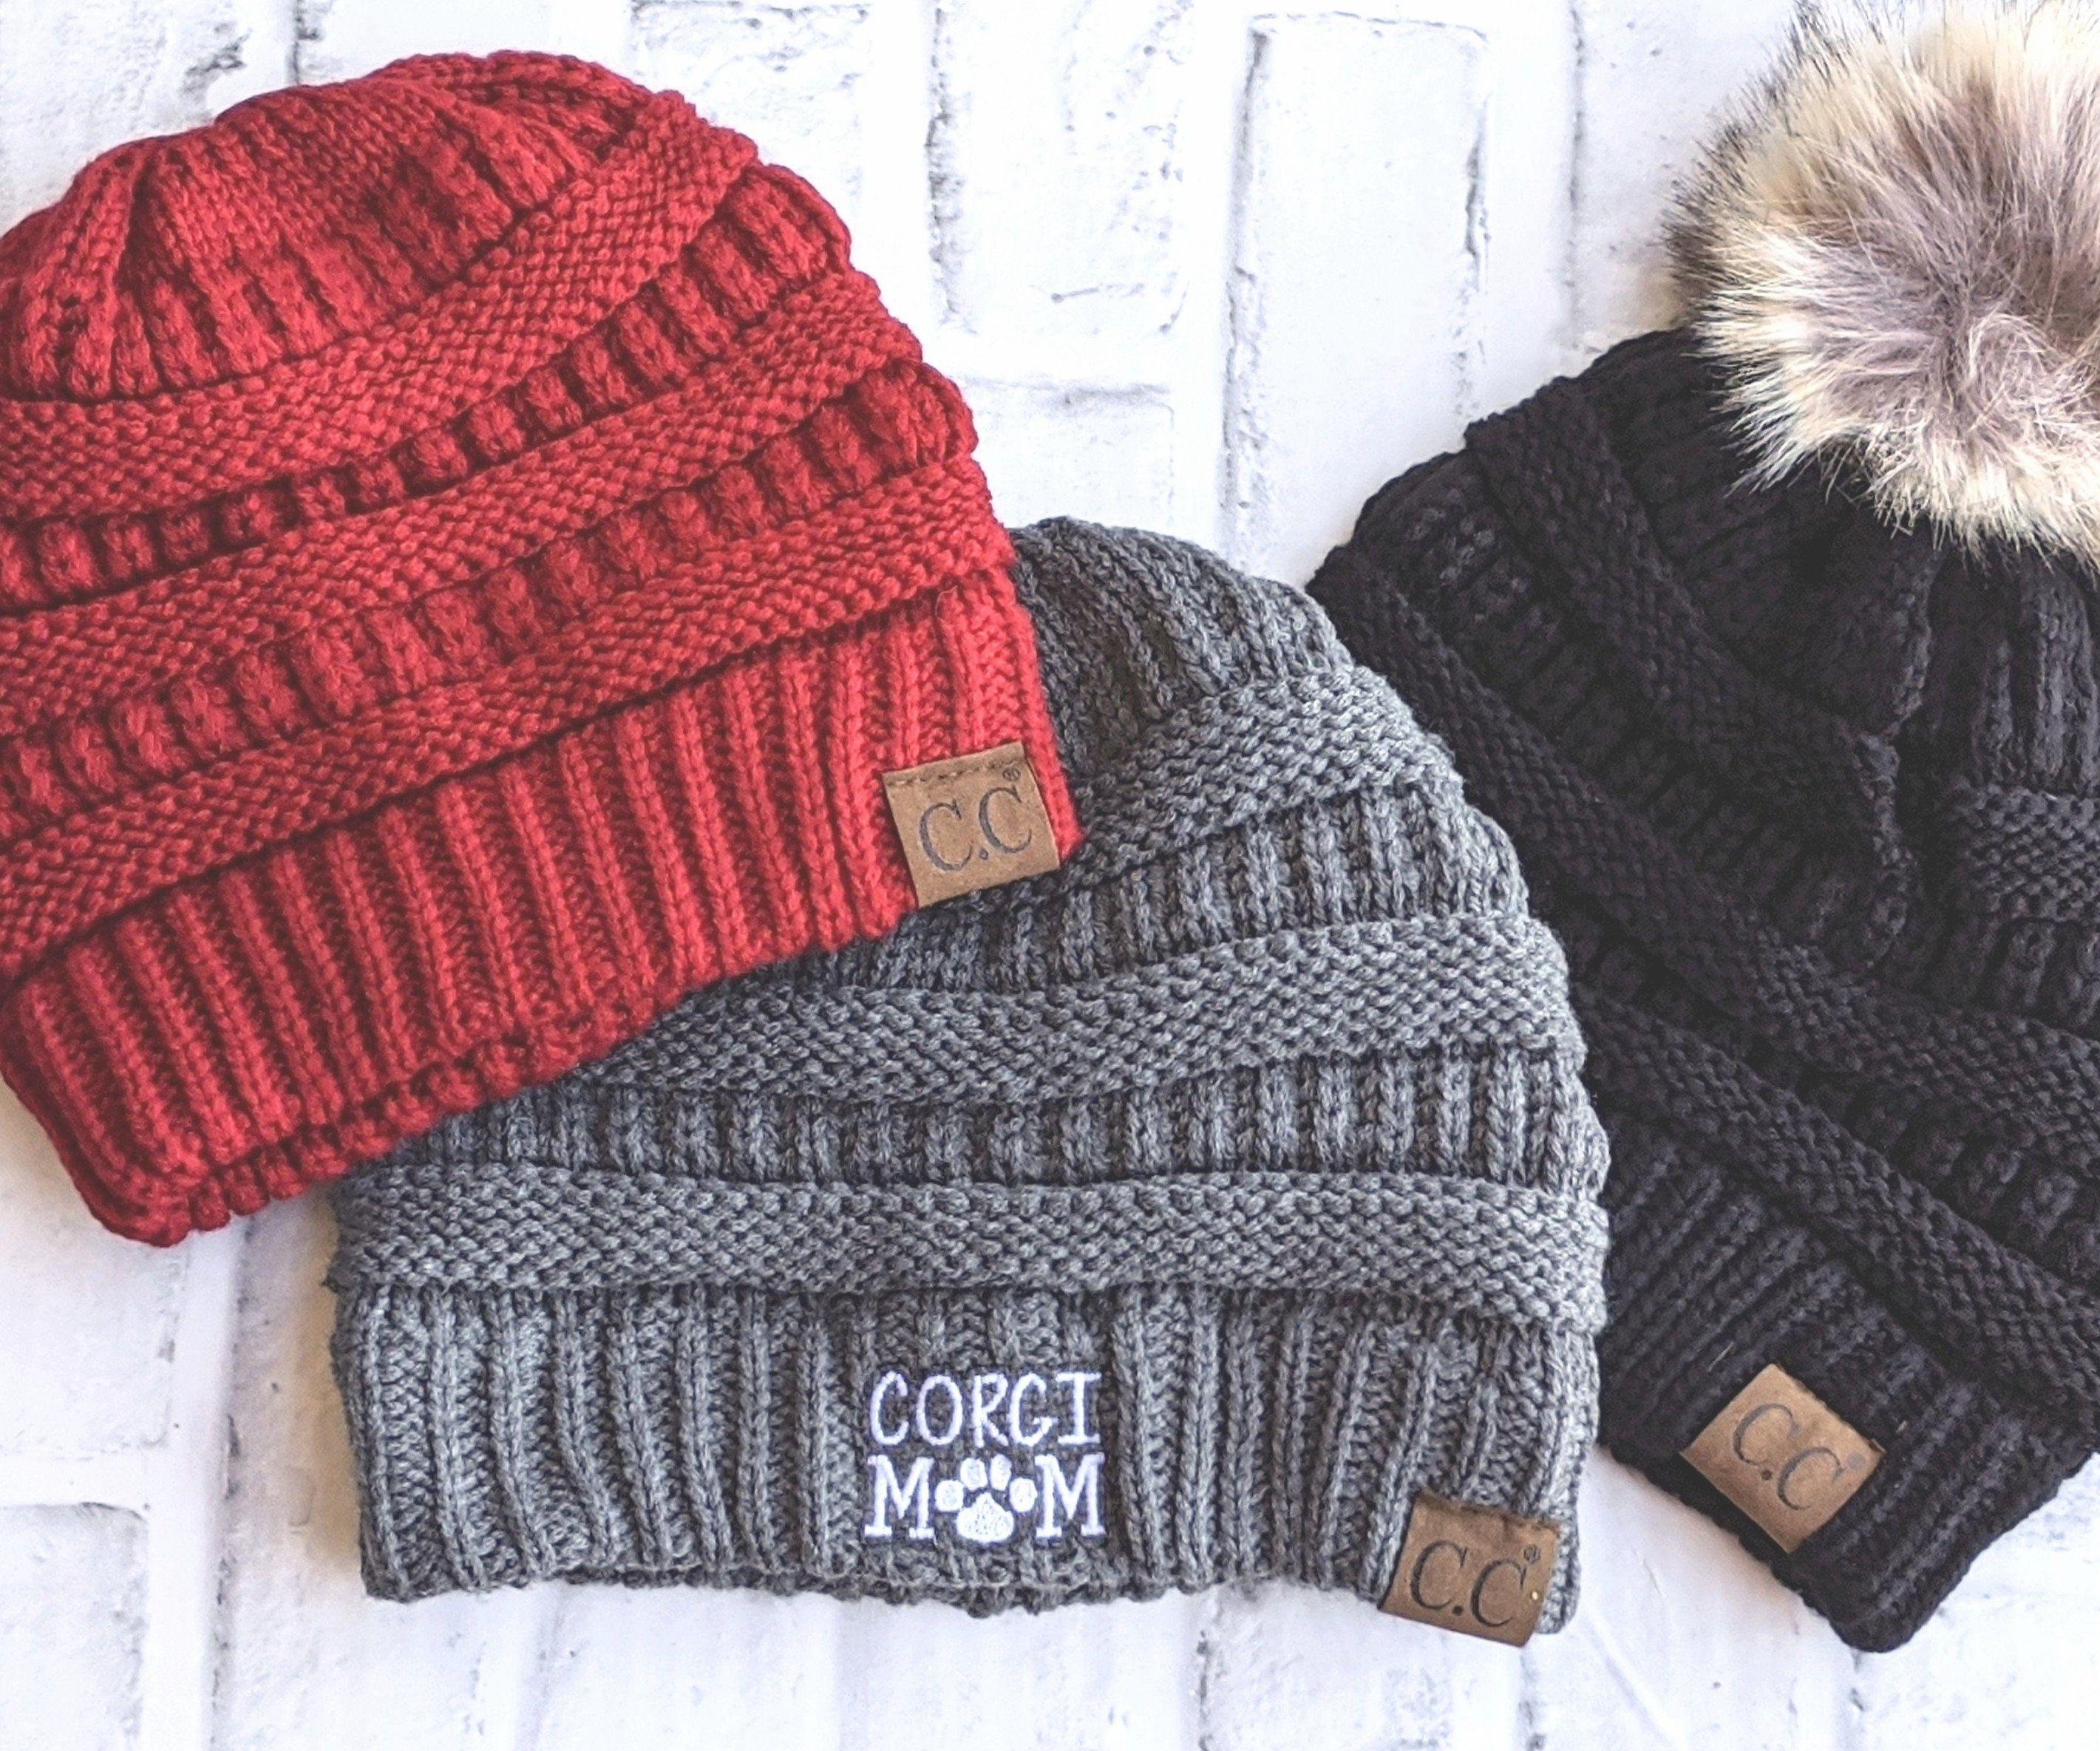 Download Corgi Mom Beanie Corgi Mom Corgi Beanie Corgi Winter Hat Etsy In 2020 Corgi Mom Winter Hats Beanie